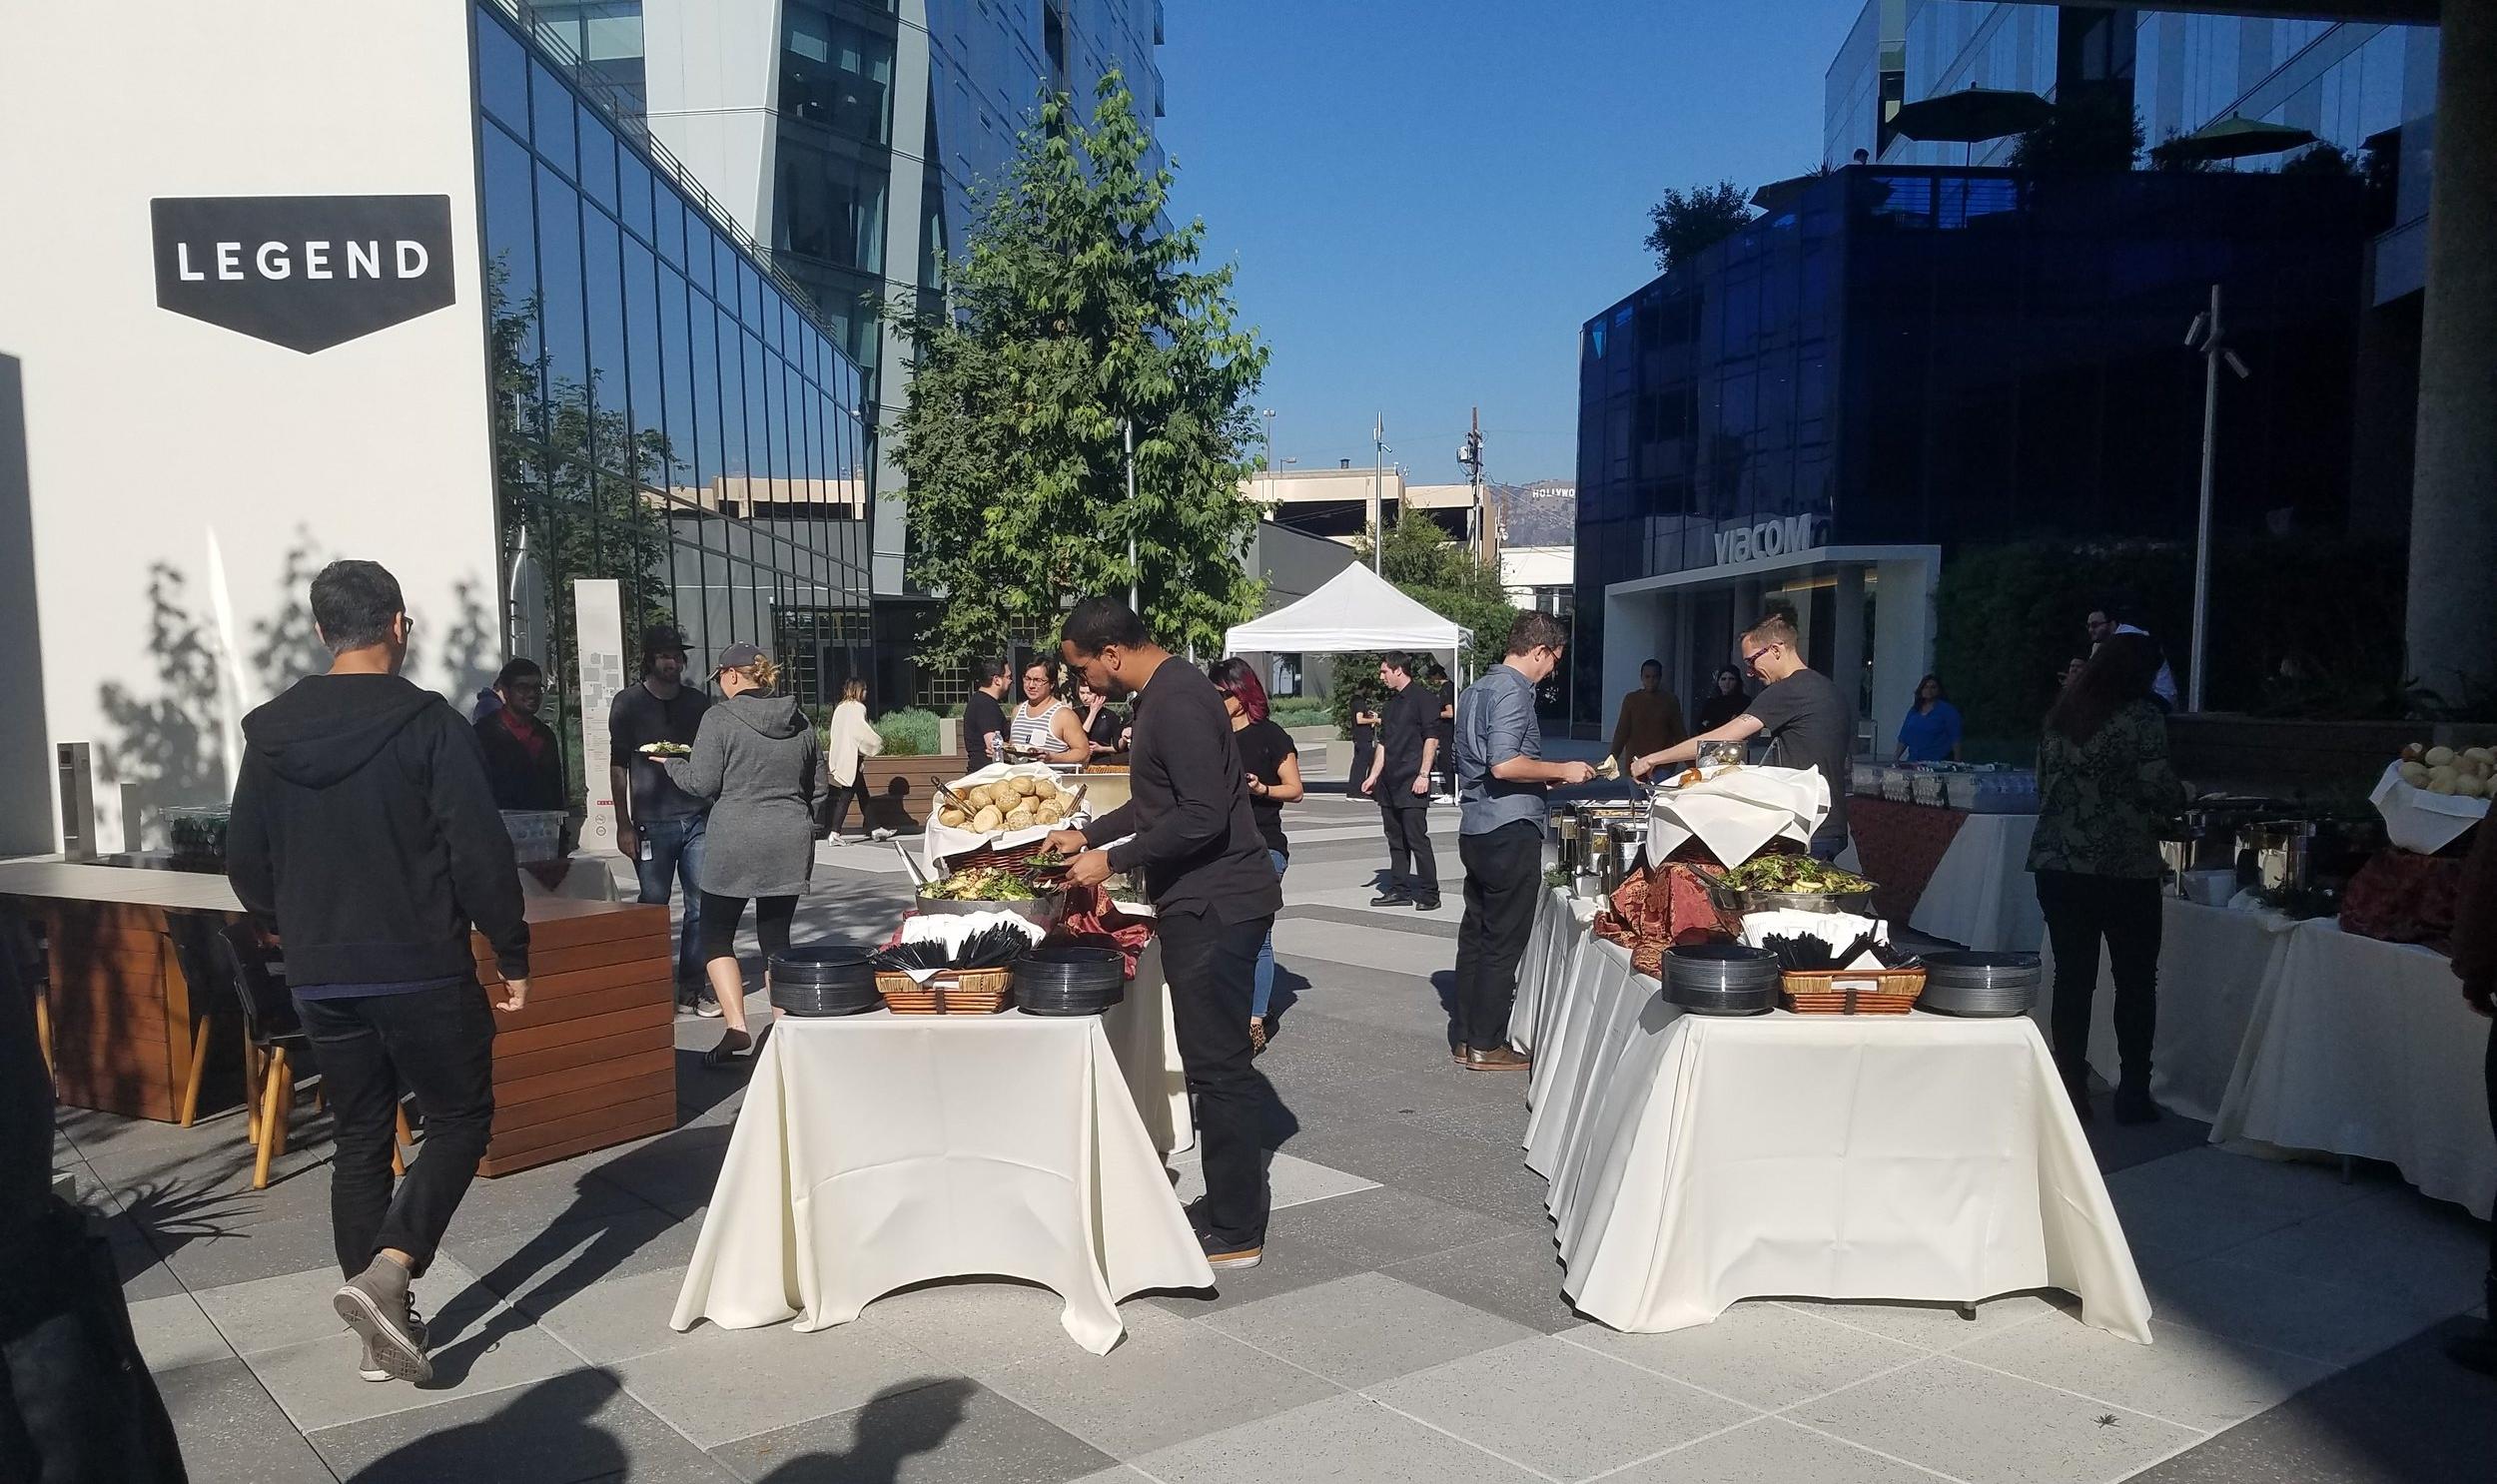 Outdoor Event Catering Service in Santa Barbara, CA